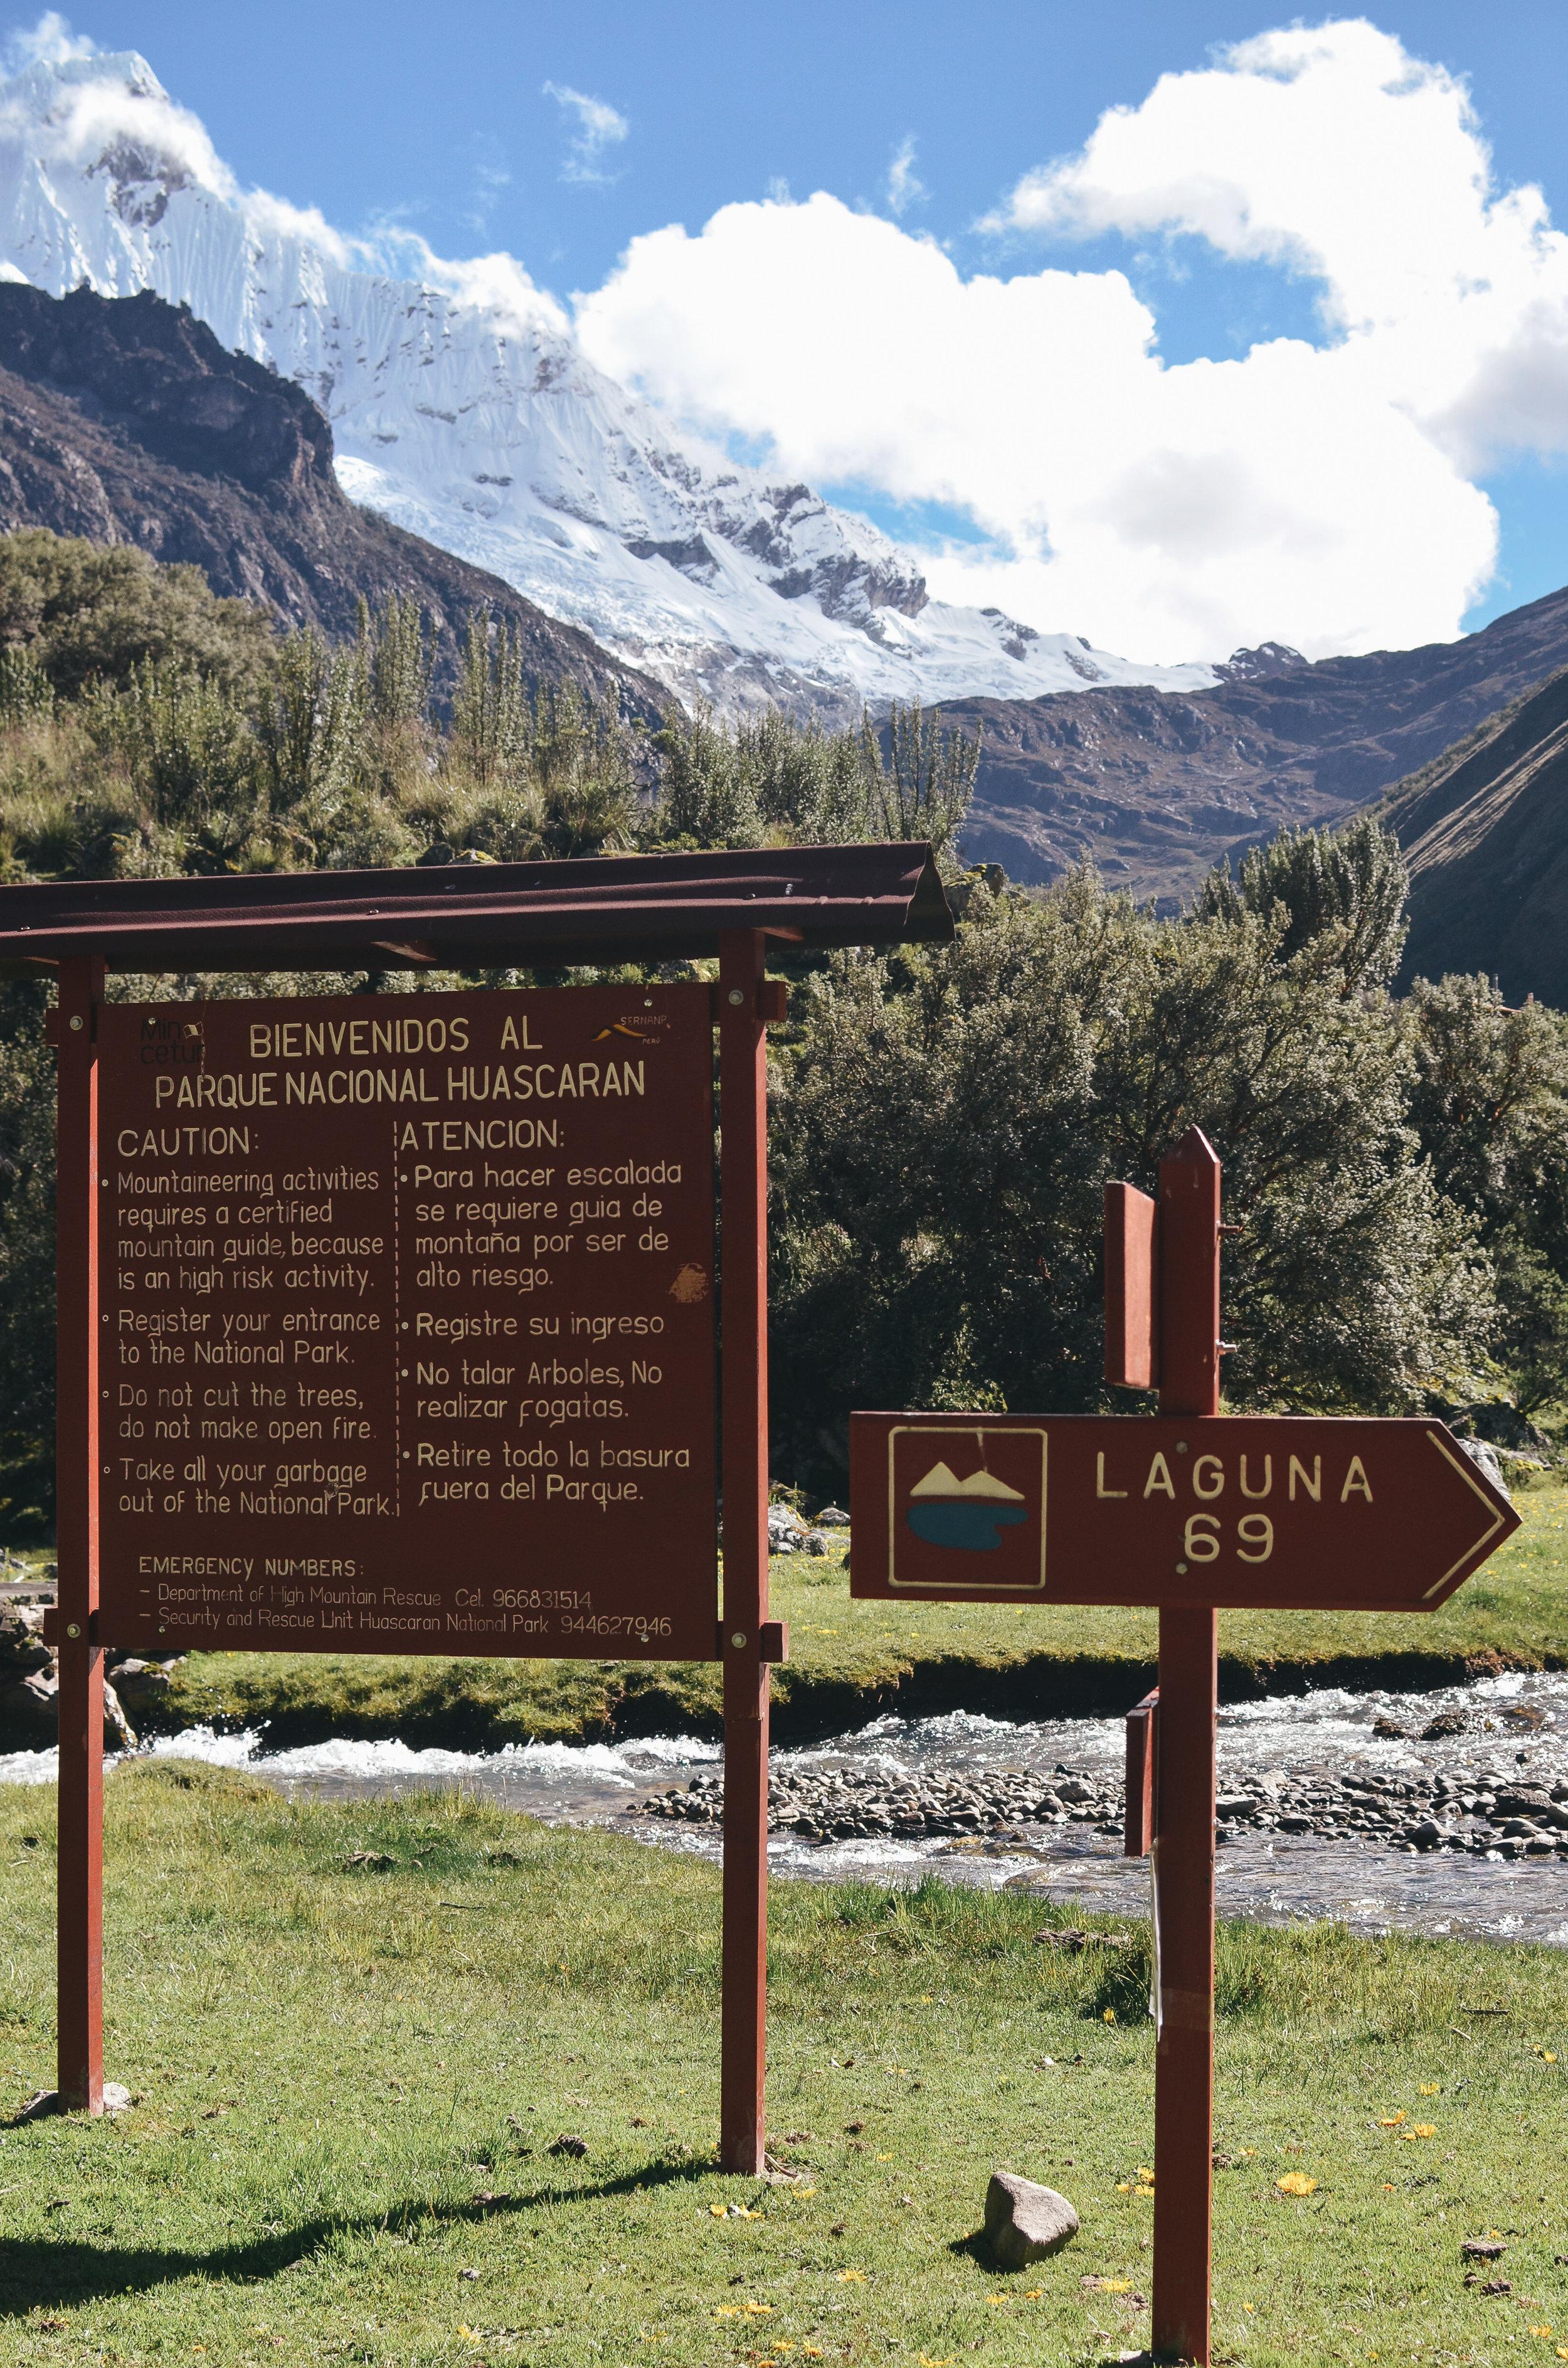 laguna+lake+69+hike+peru+travel+guide+life+on+pine_DSC_0450.jpg